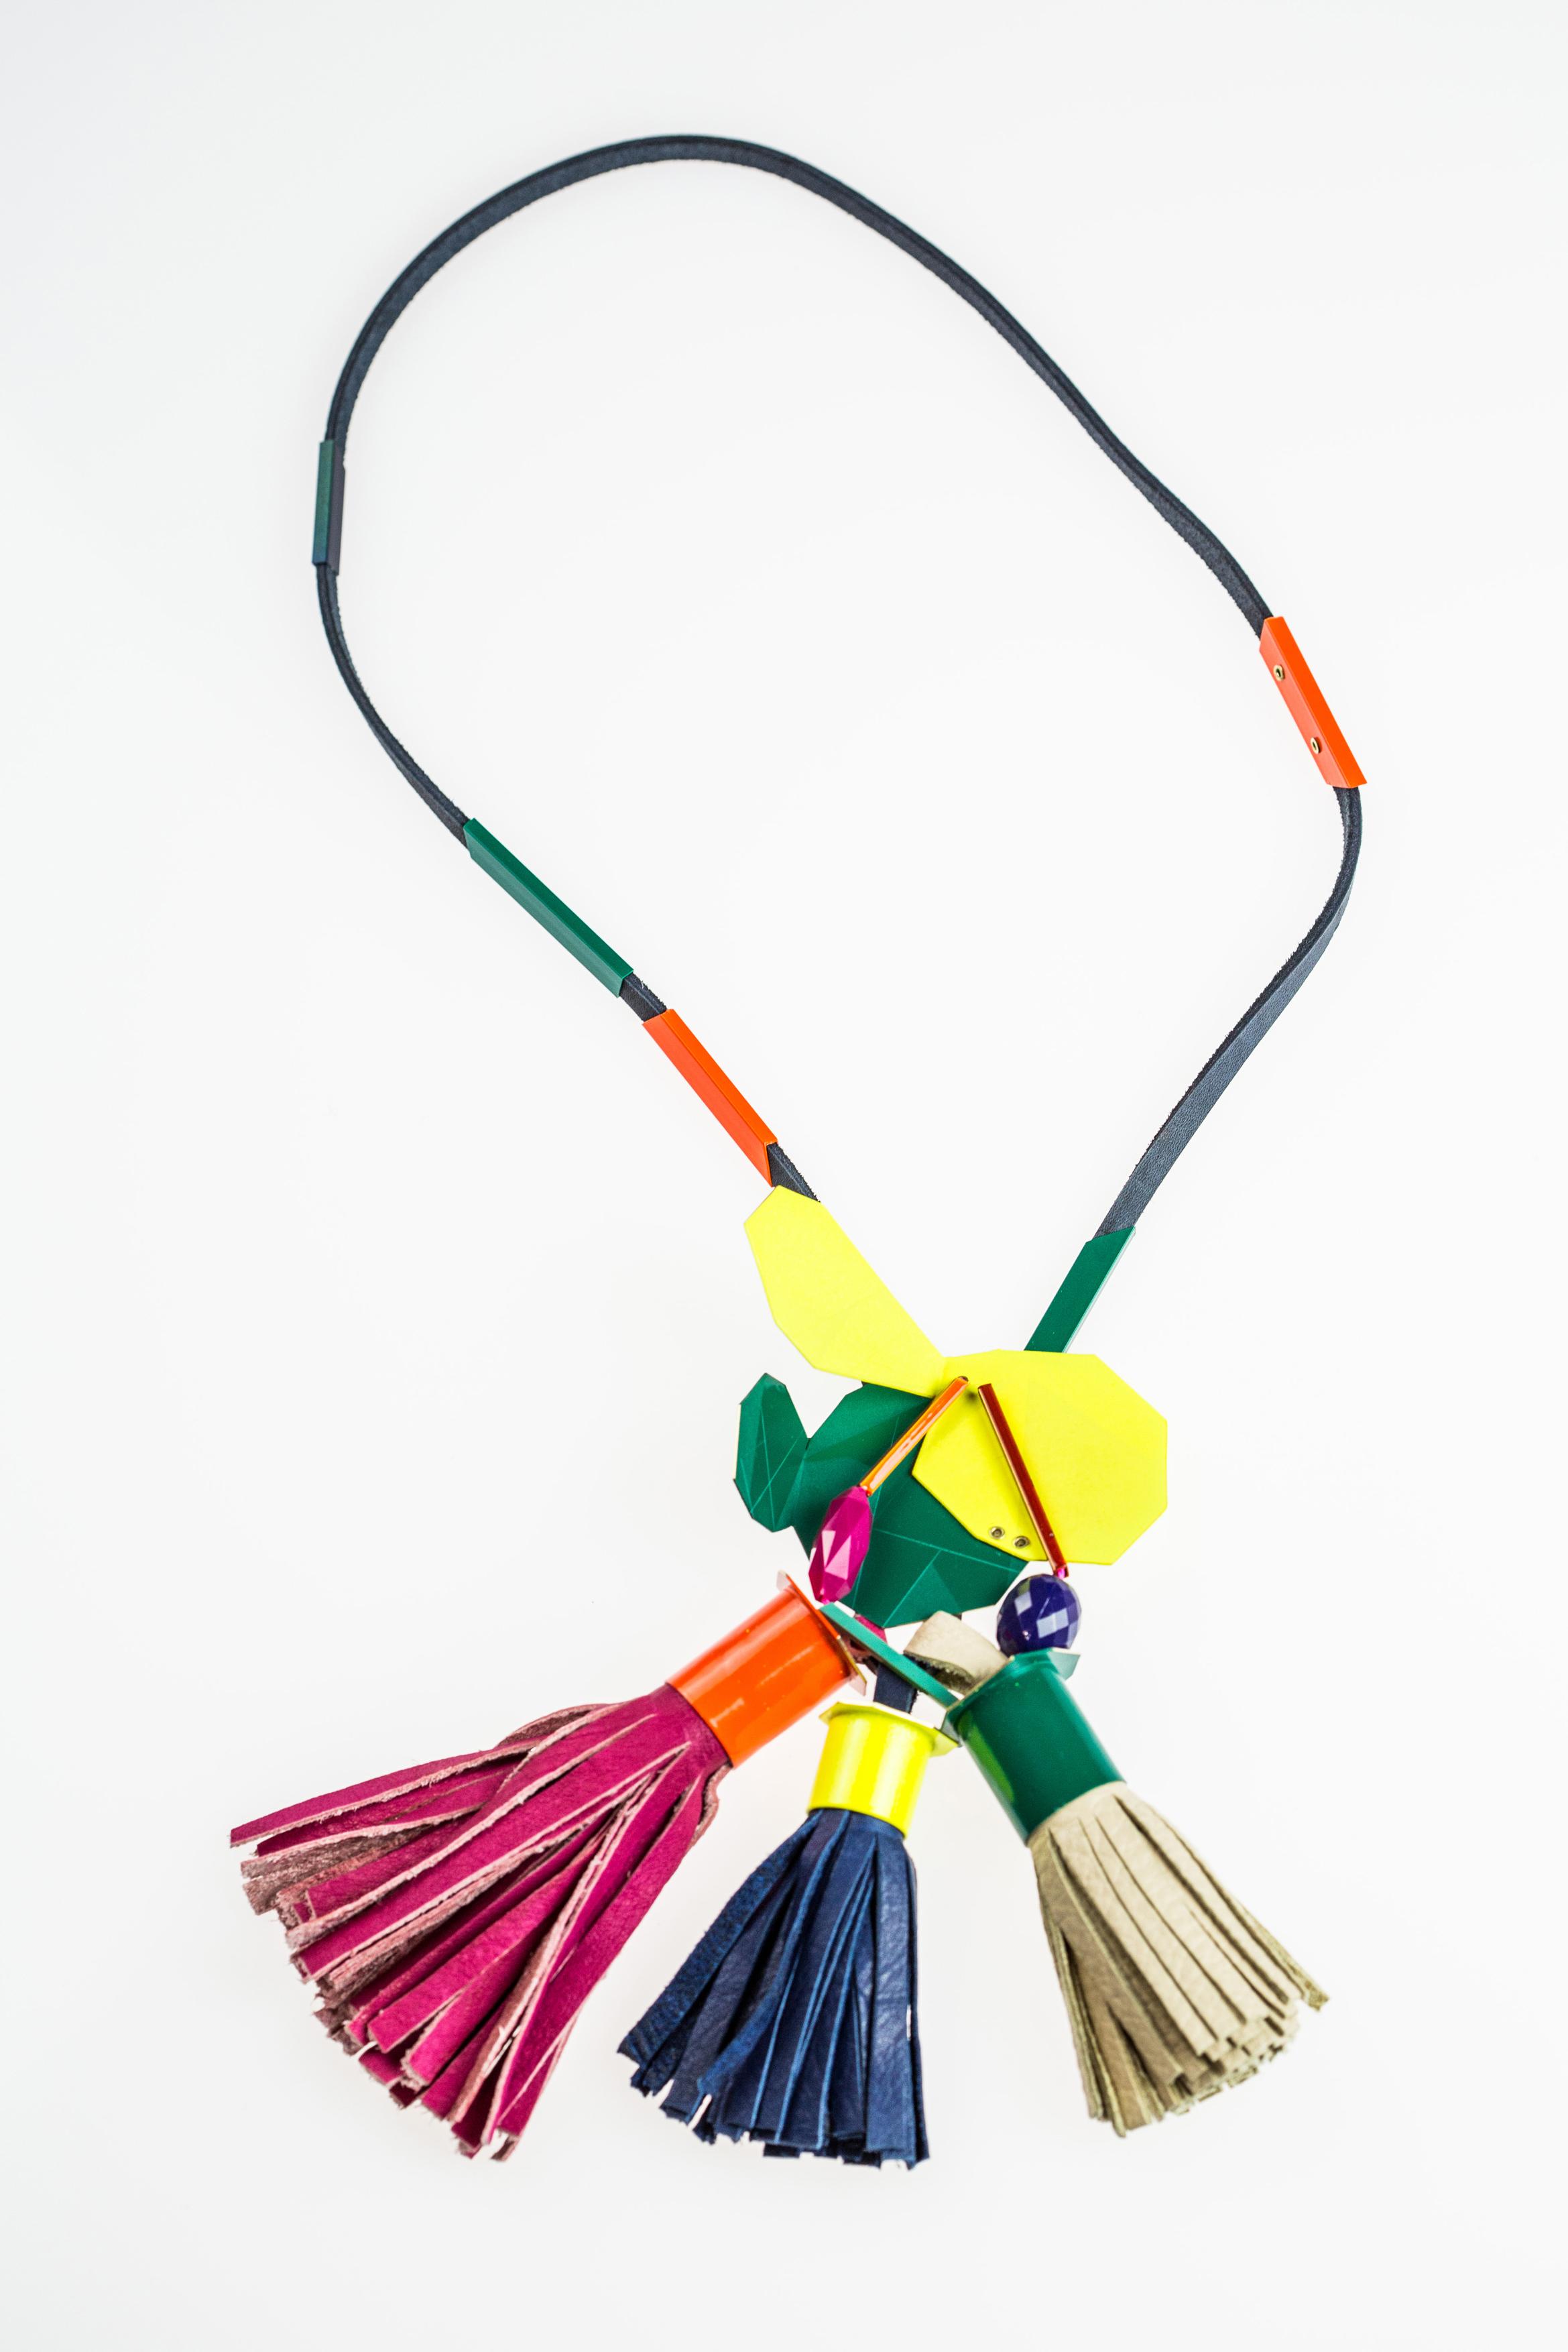 2 Gems and Tassels Necklace_Voegele.jpg